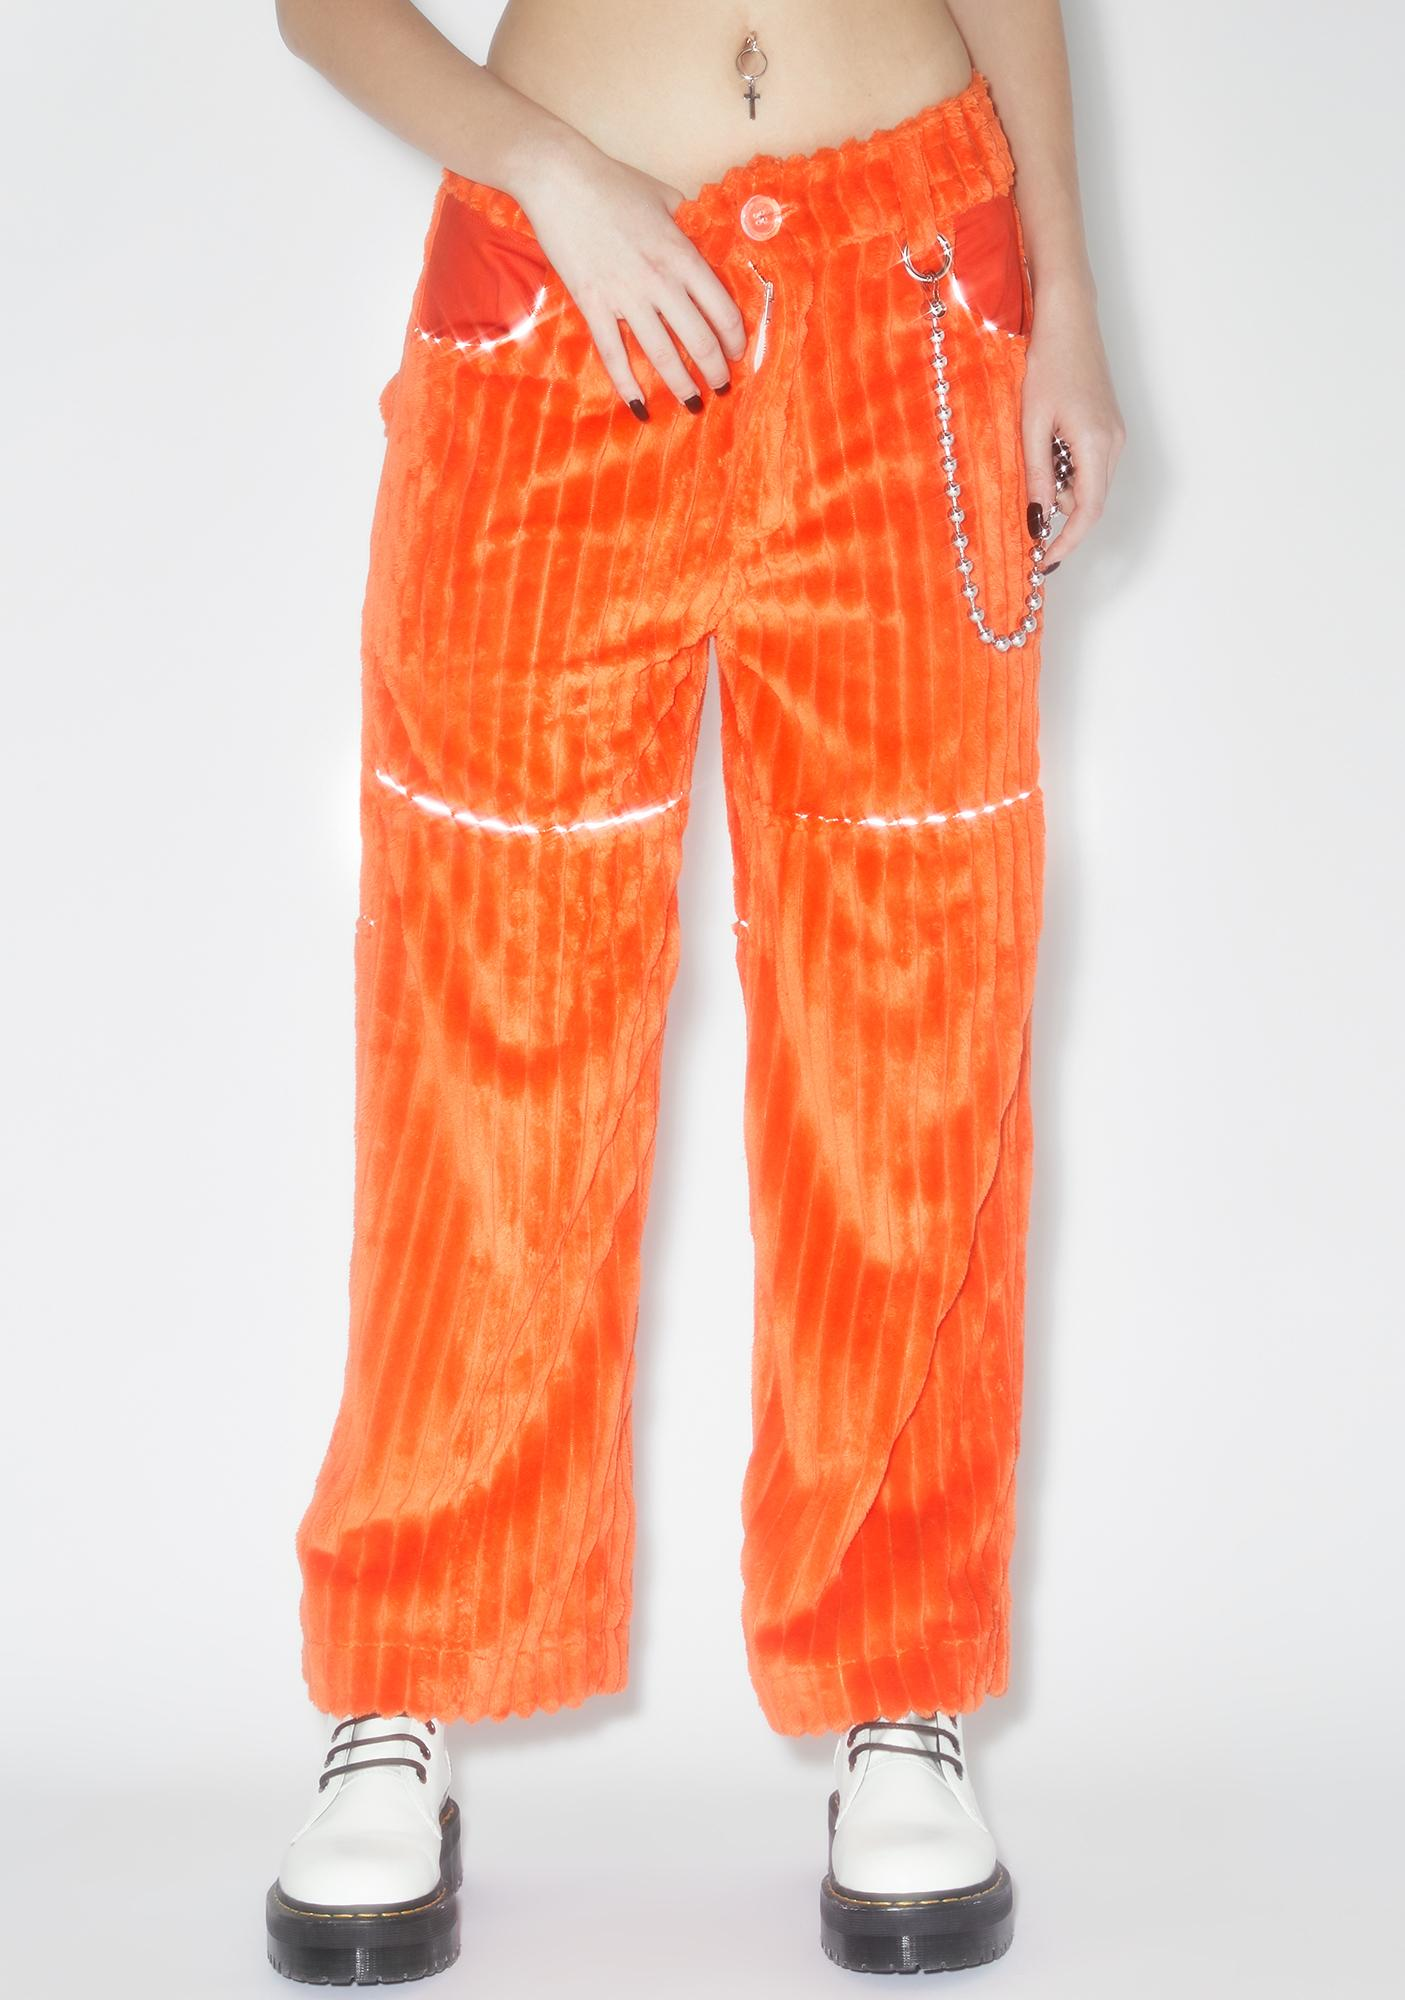 Somewhere Nowhere Orange Jumbo Corduroy Pants V.2